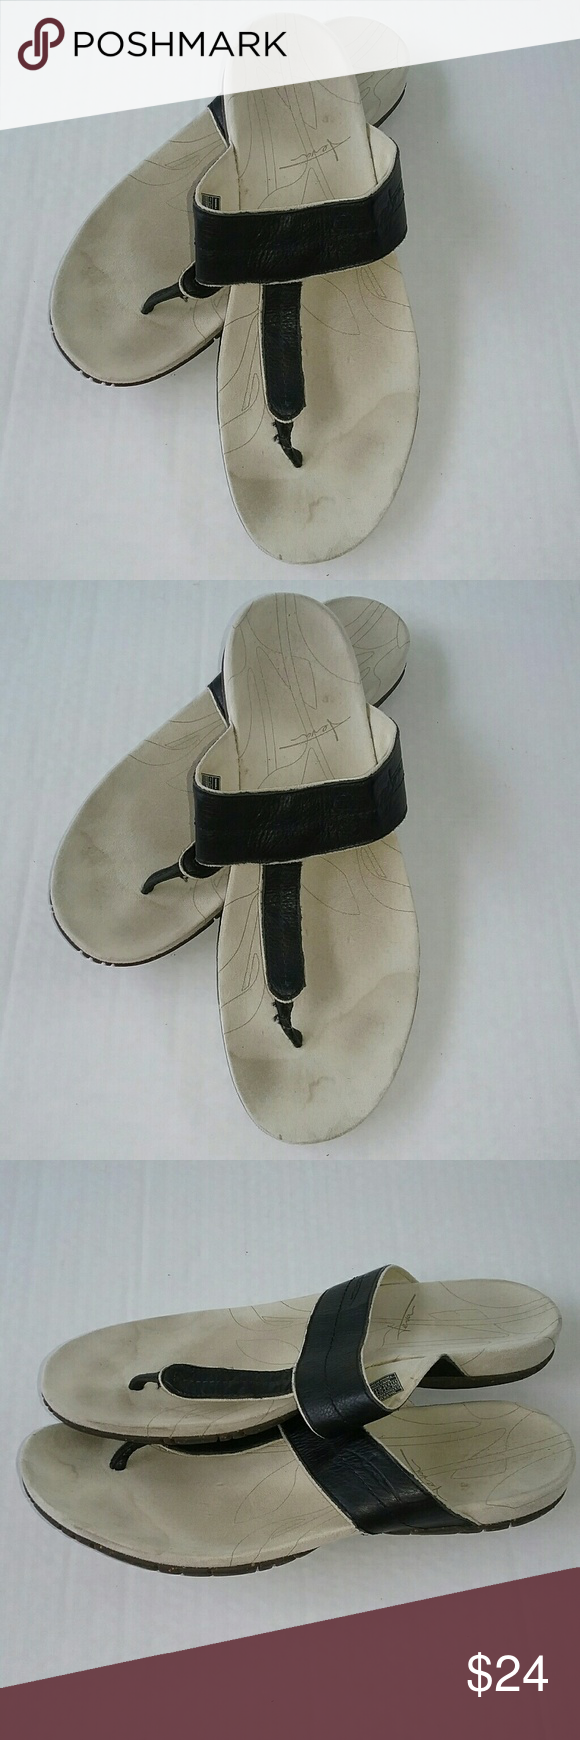 Black sandals size 11 - Teva Black Keely T Strap Sandals Size 11 This Is A Pair Of Teva Black T